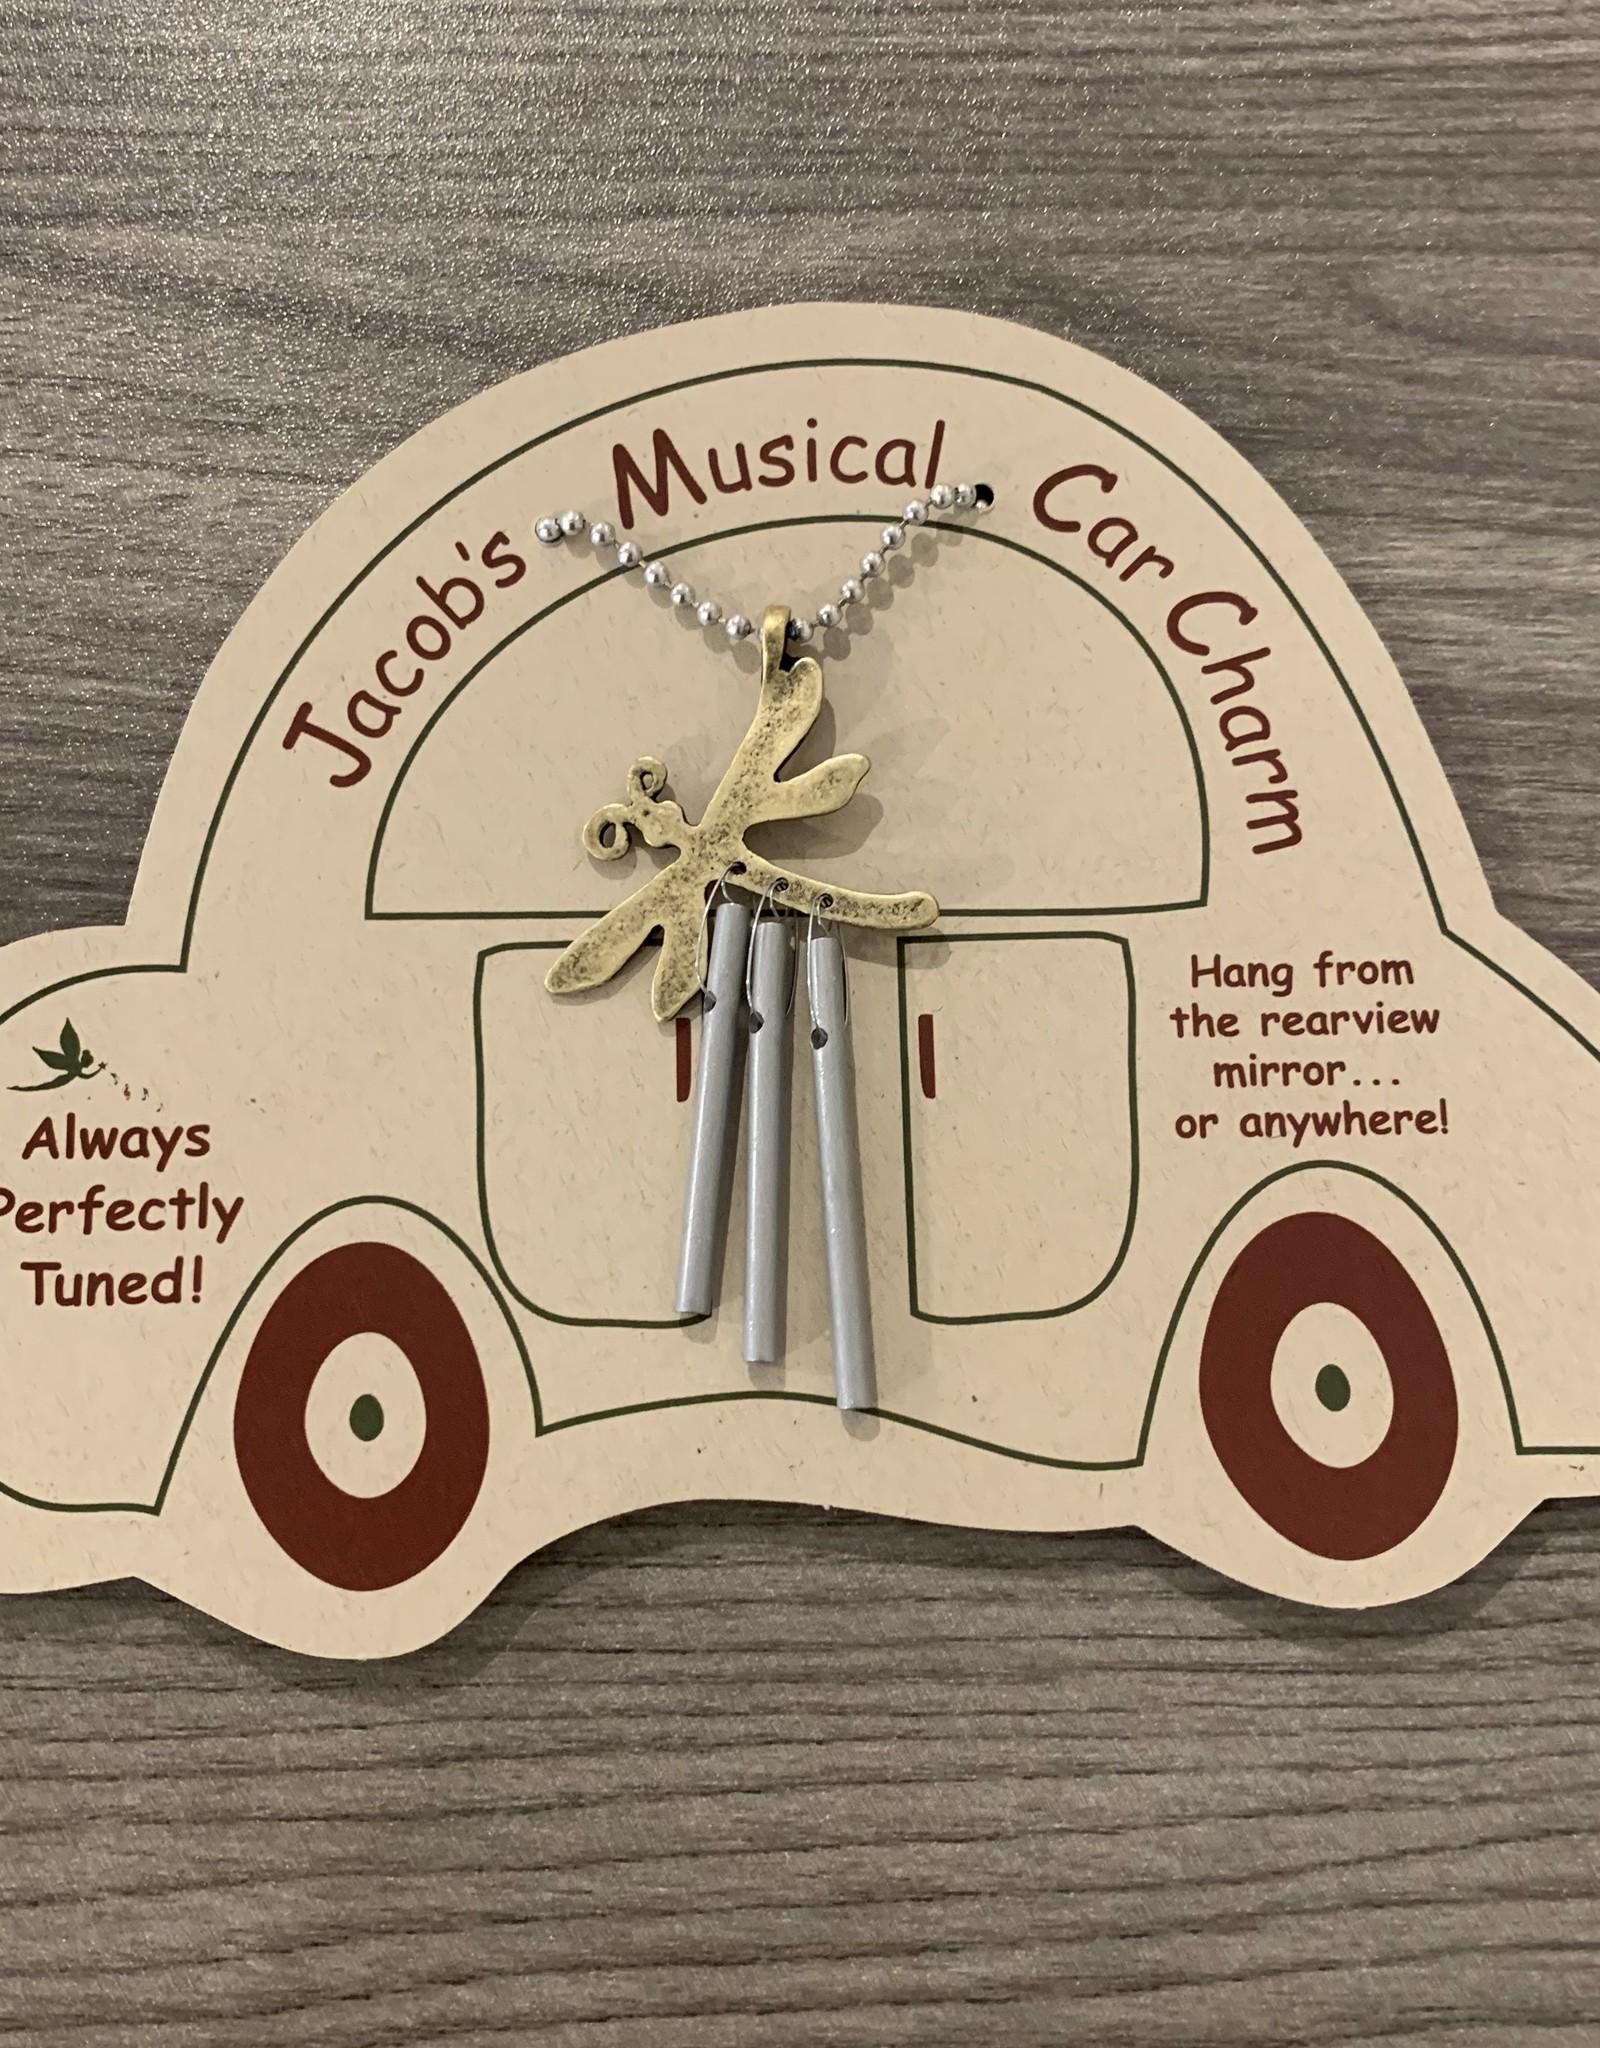 Jacob's Musical Chimes Dragonfly Car Charm